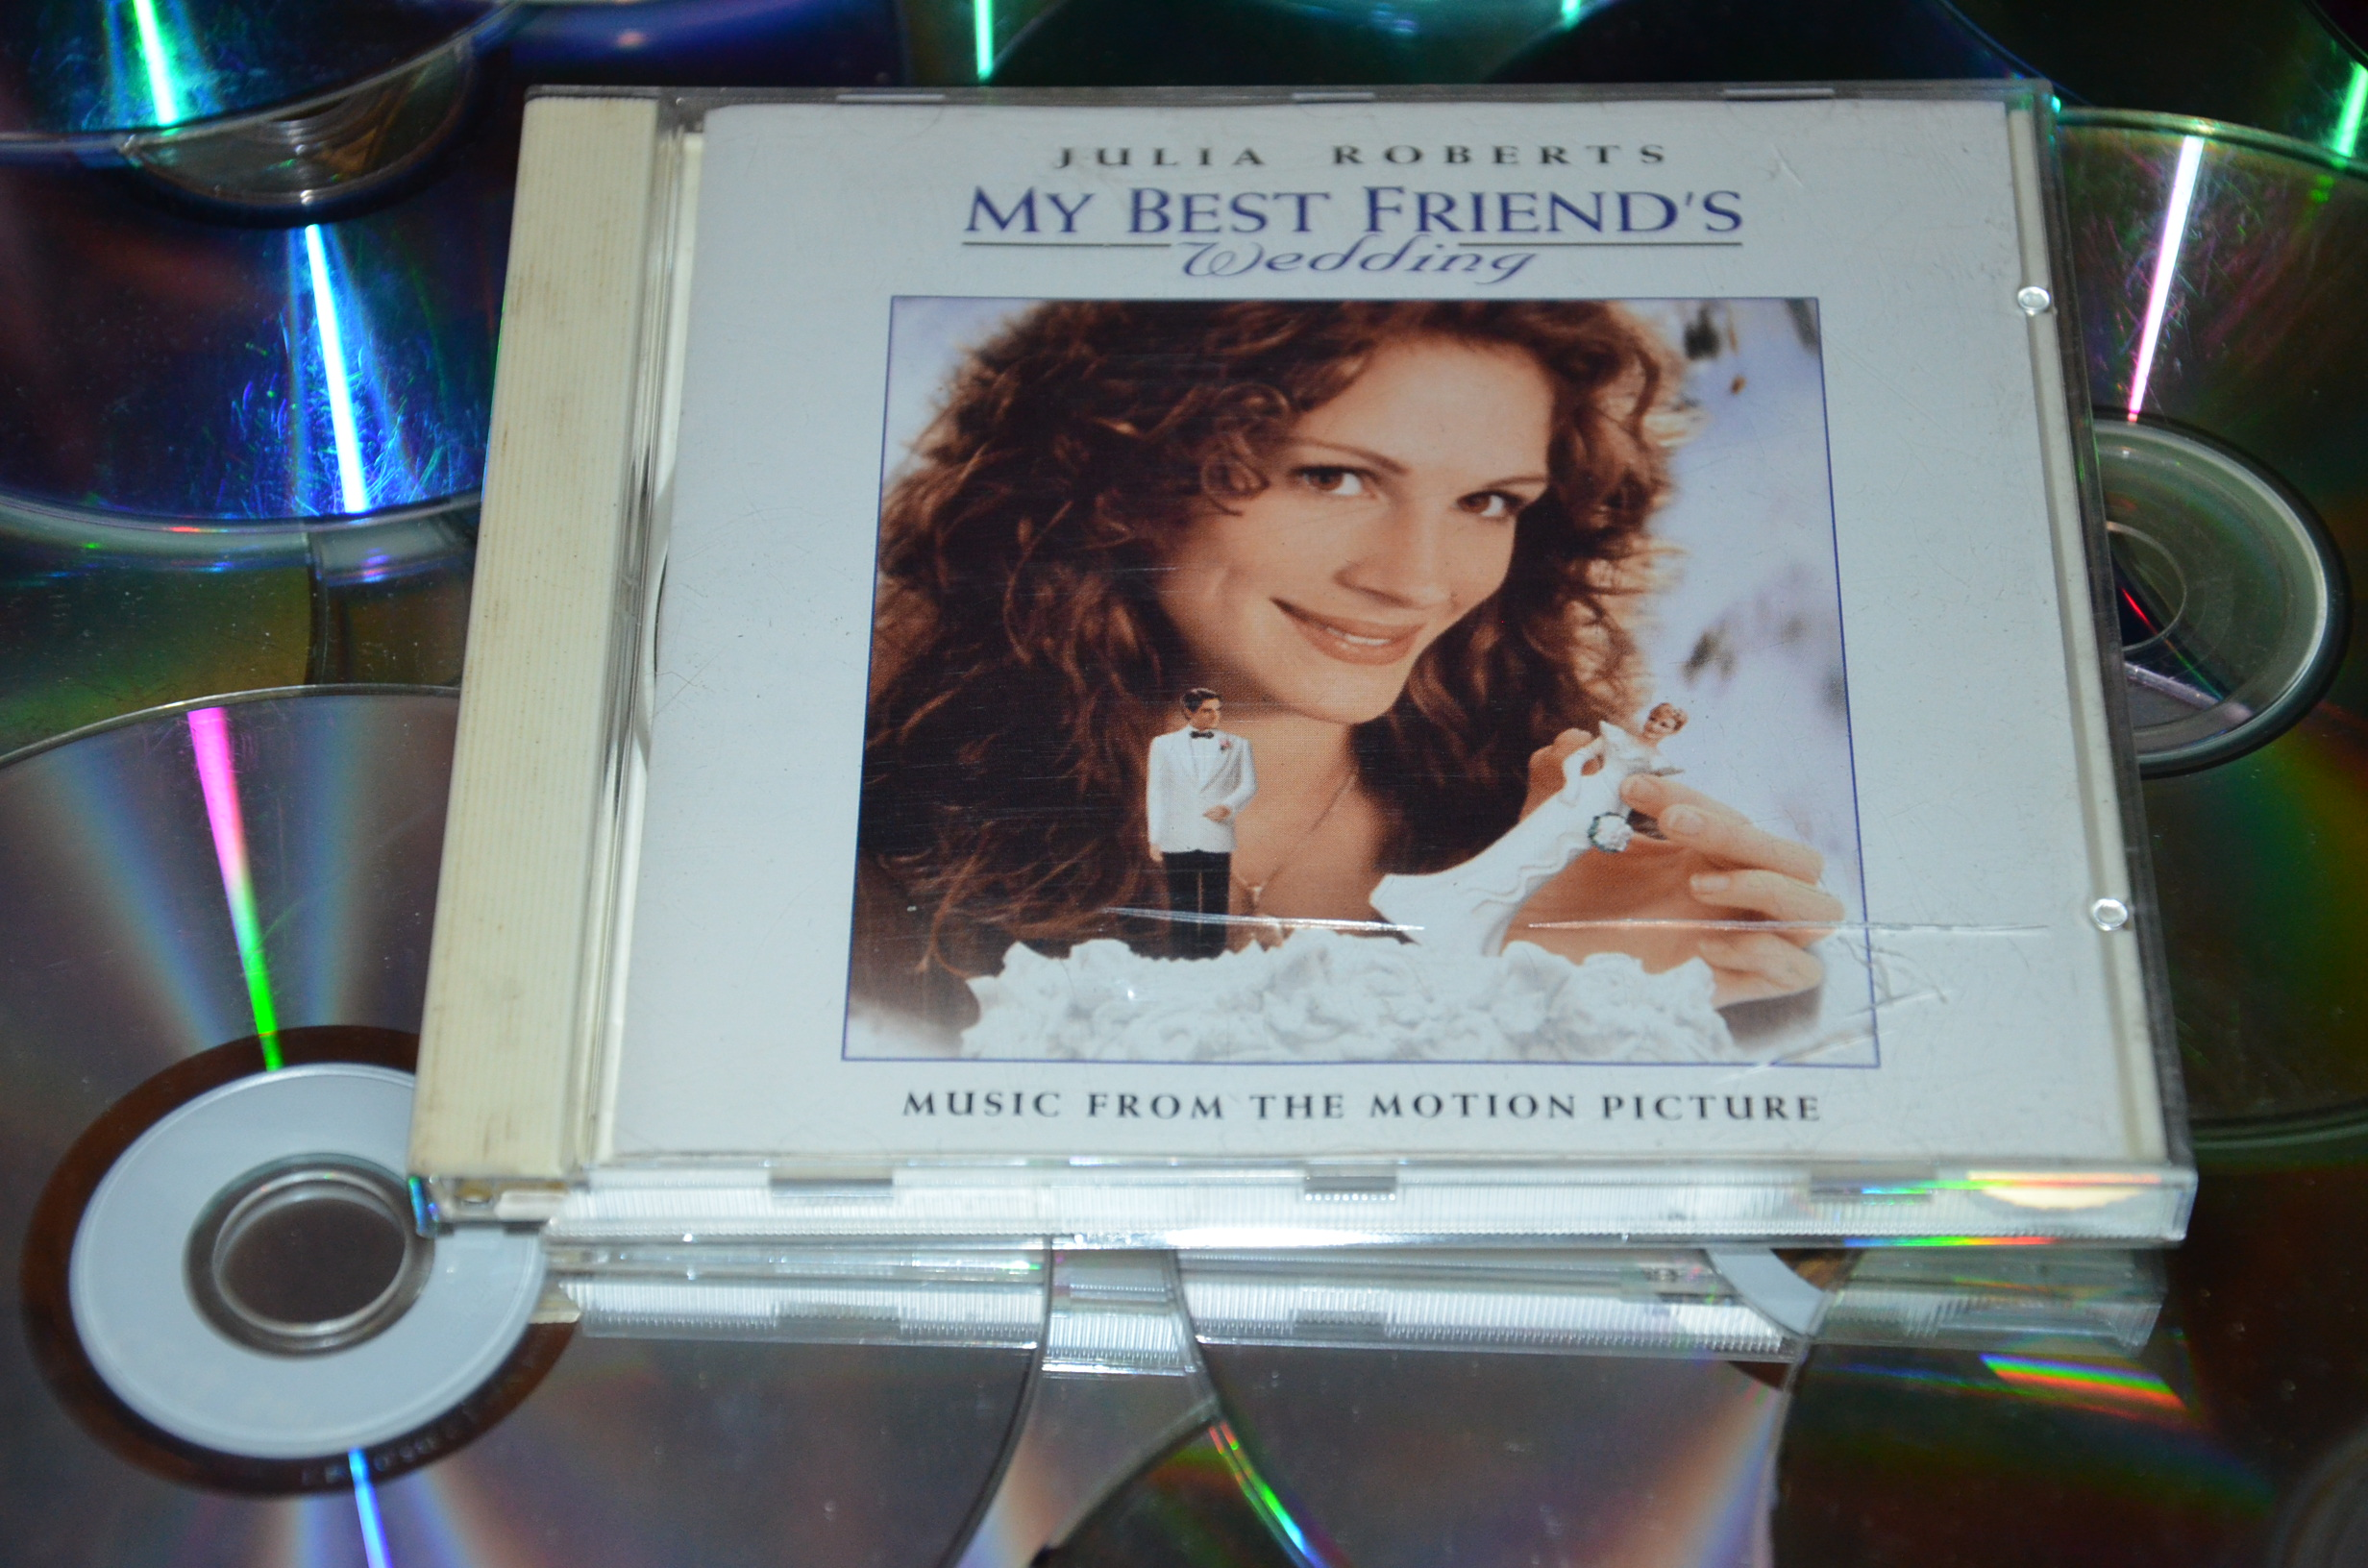 My Best Friend S Wedding Soundtrack.My Best Friend S Wedding Soundtrack 1997 Columbia